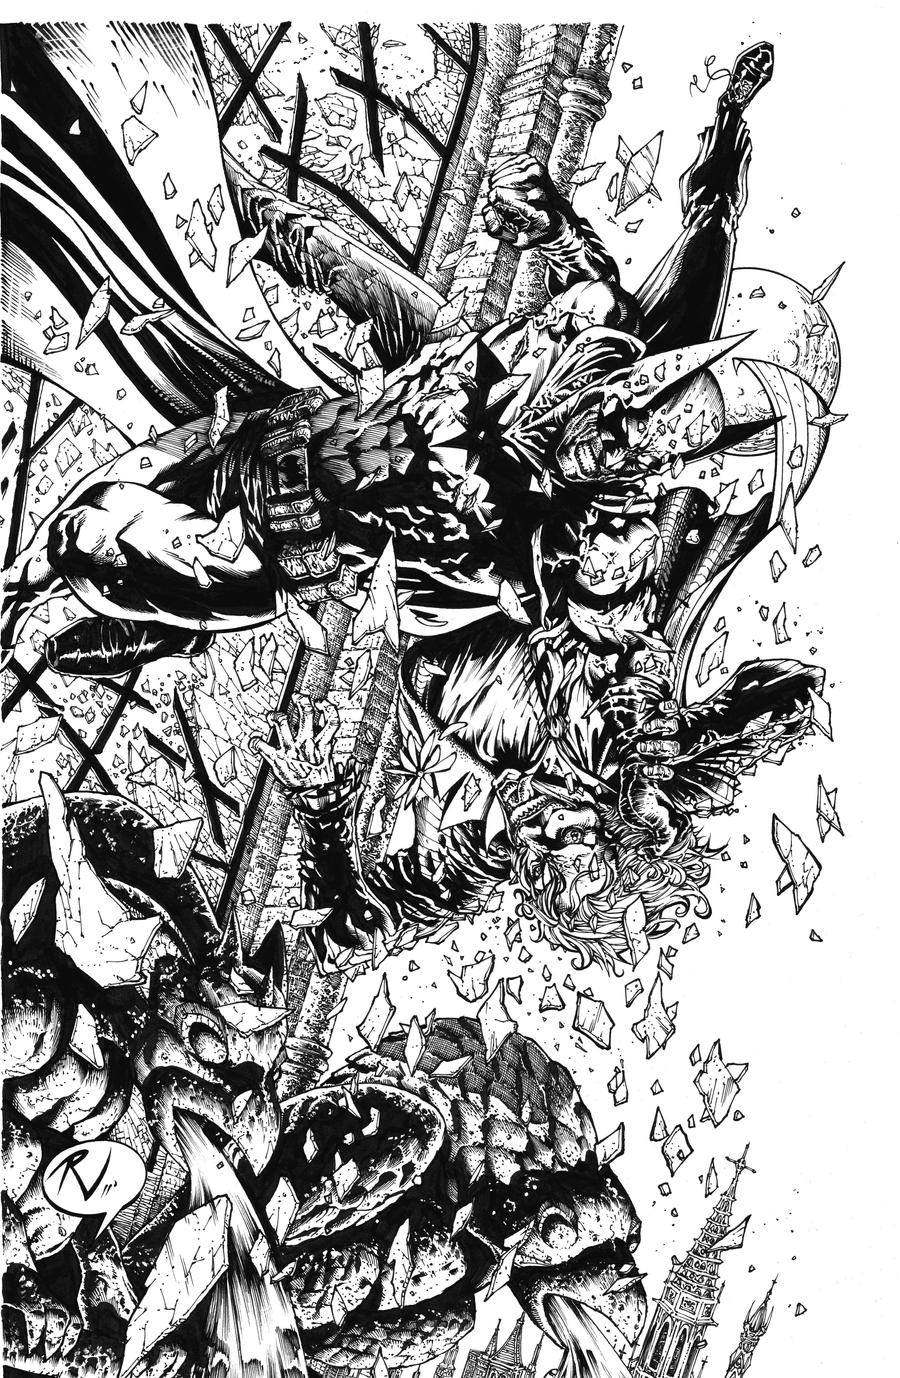 batman vs joker final inks by rudyvasquez on deviantart